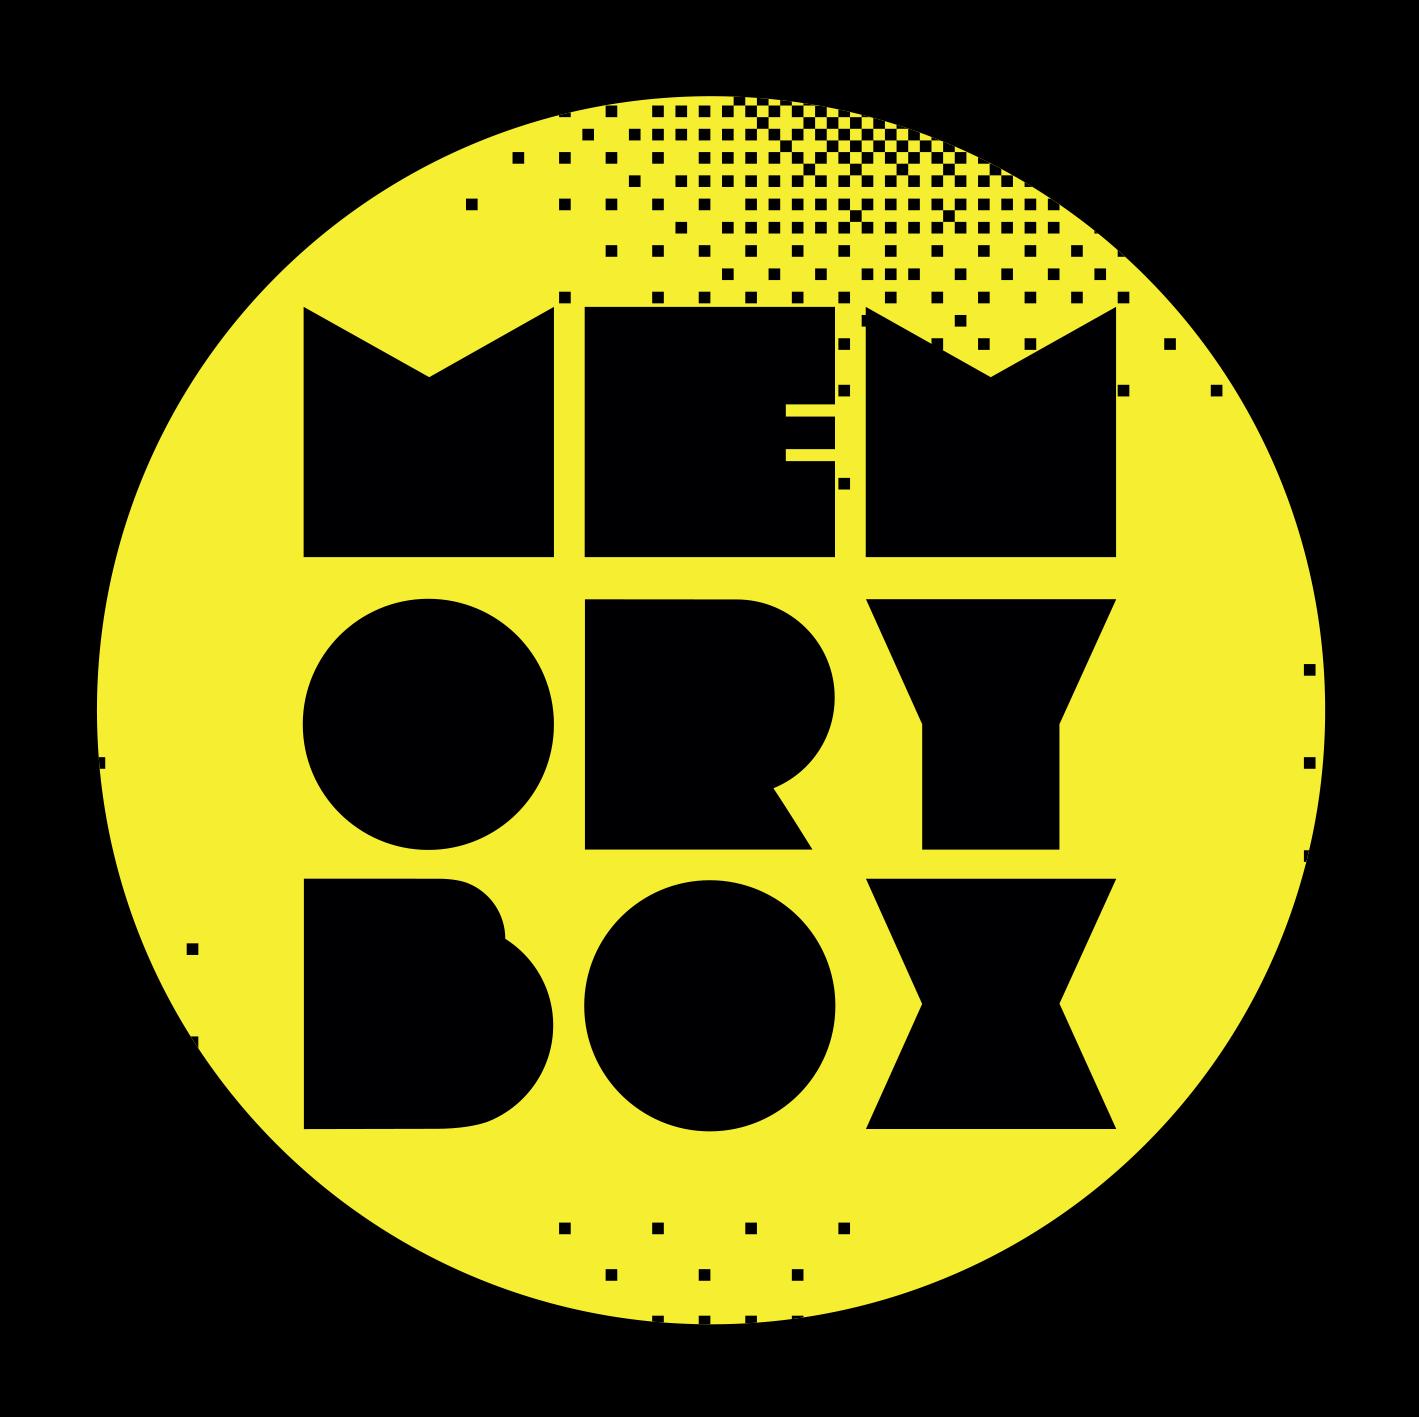 MB04-A Side label-blackbackground.png